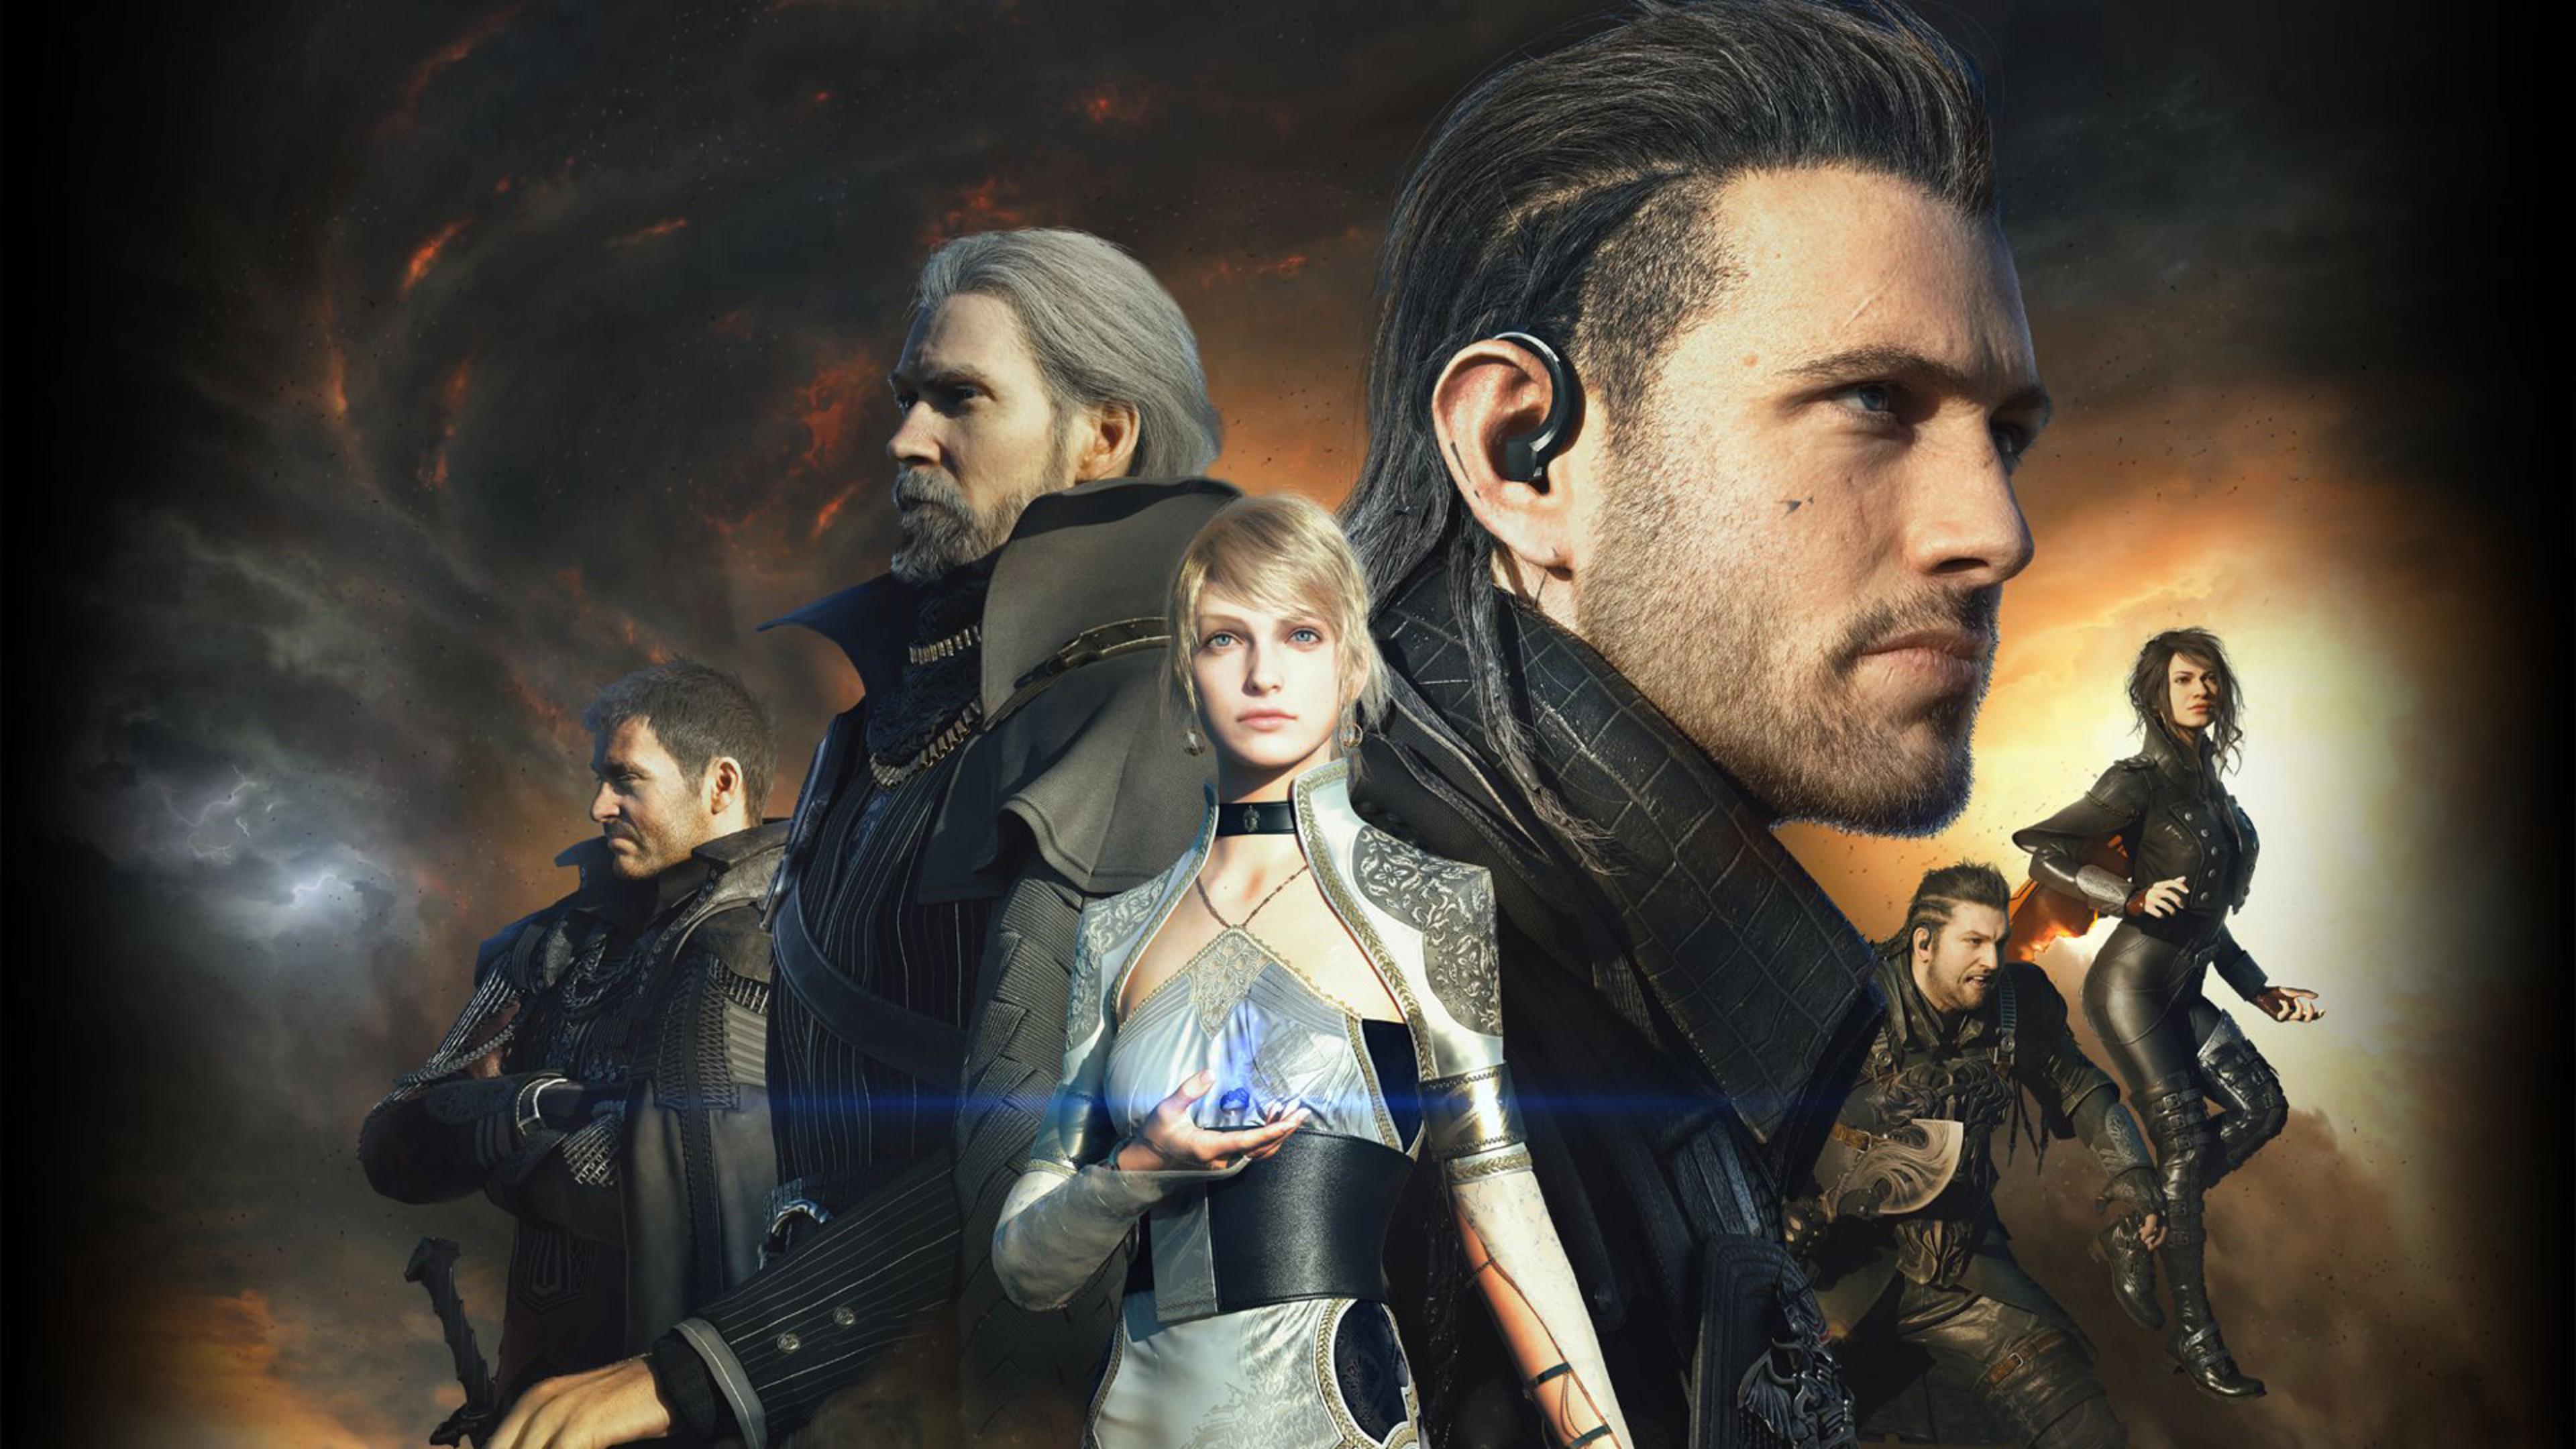 2560x1080 Final Fantasy Xv Ps4 2560x1080 Resolution Hd 4k: 3840x2160 Kingsglaive Final Fantasy XV 4k HD 4k Wallpapers